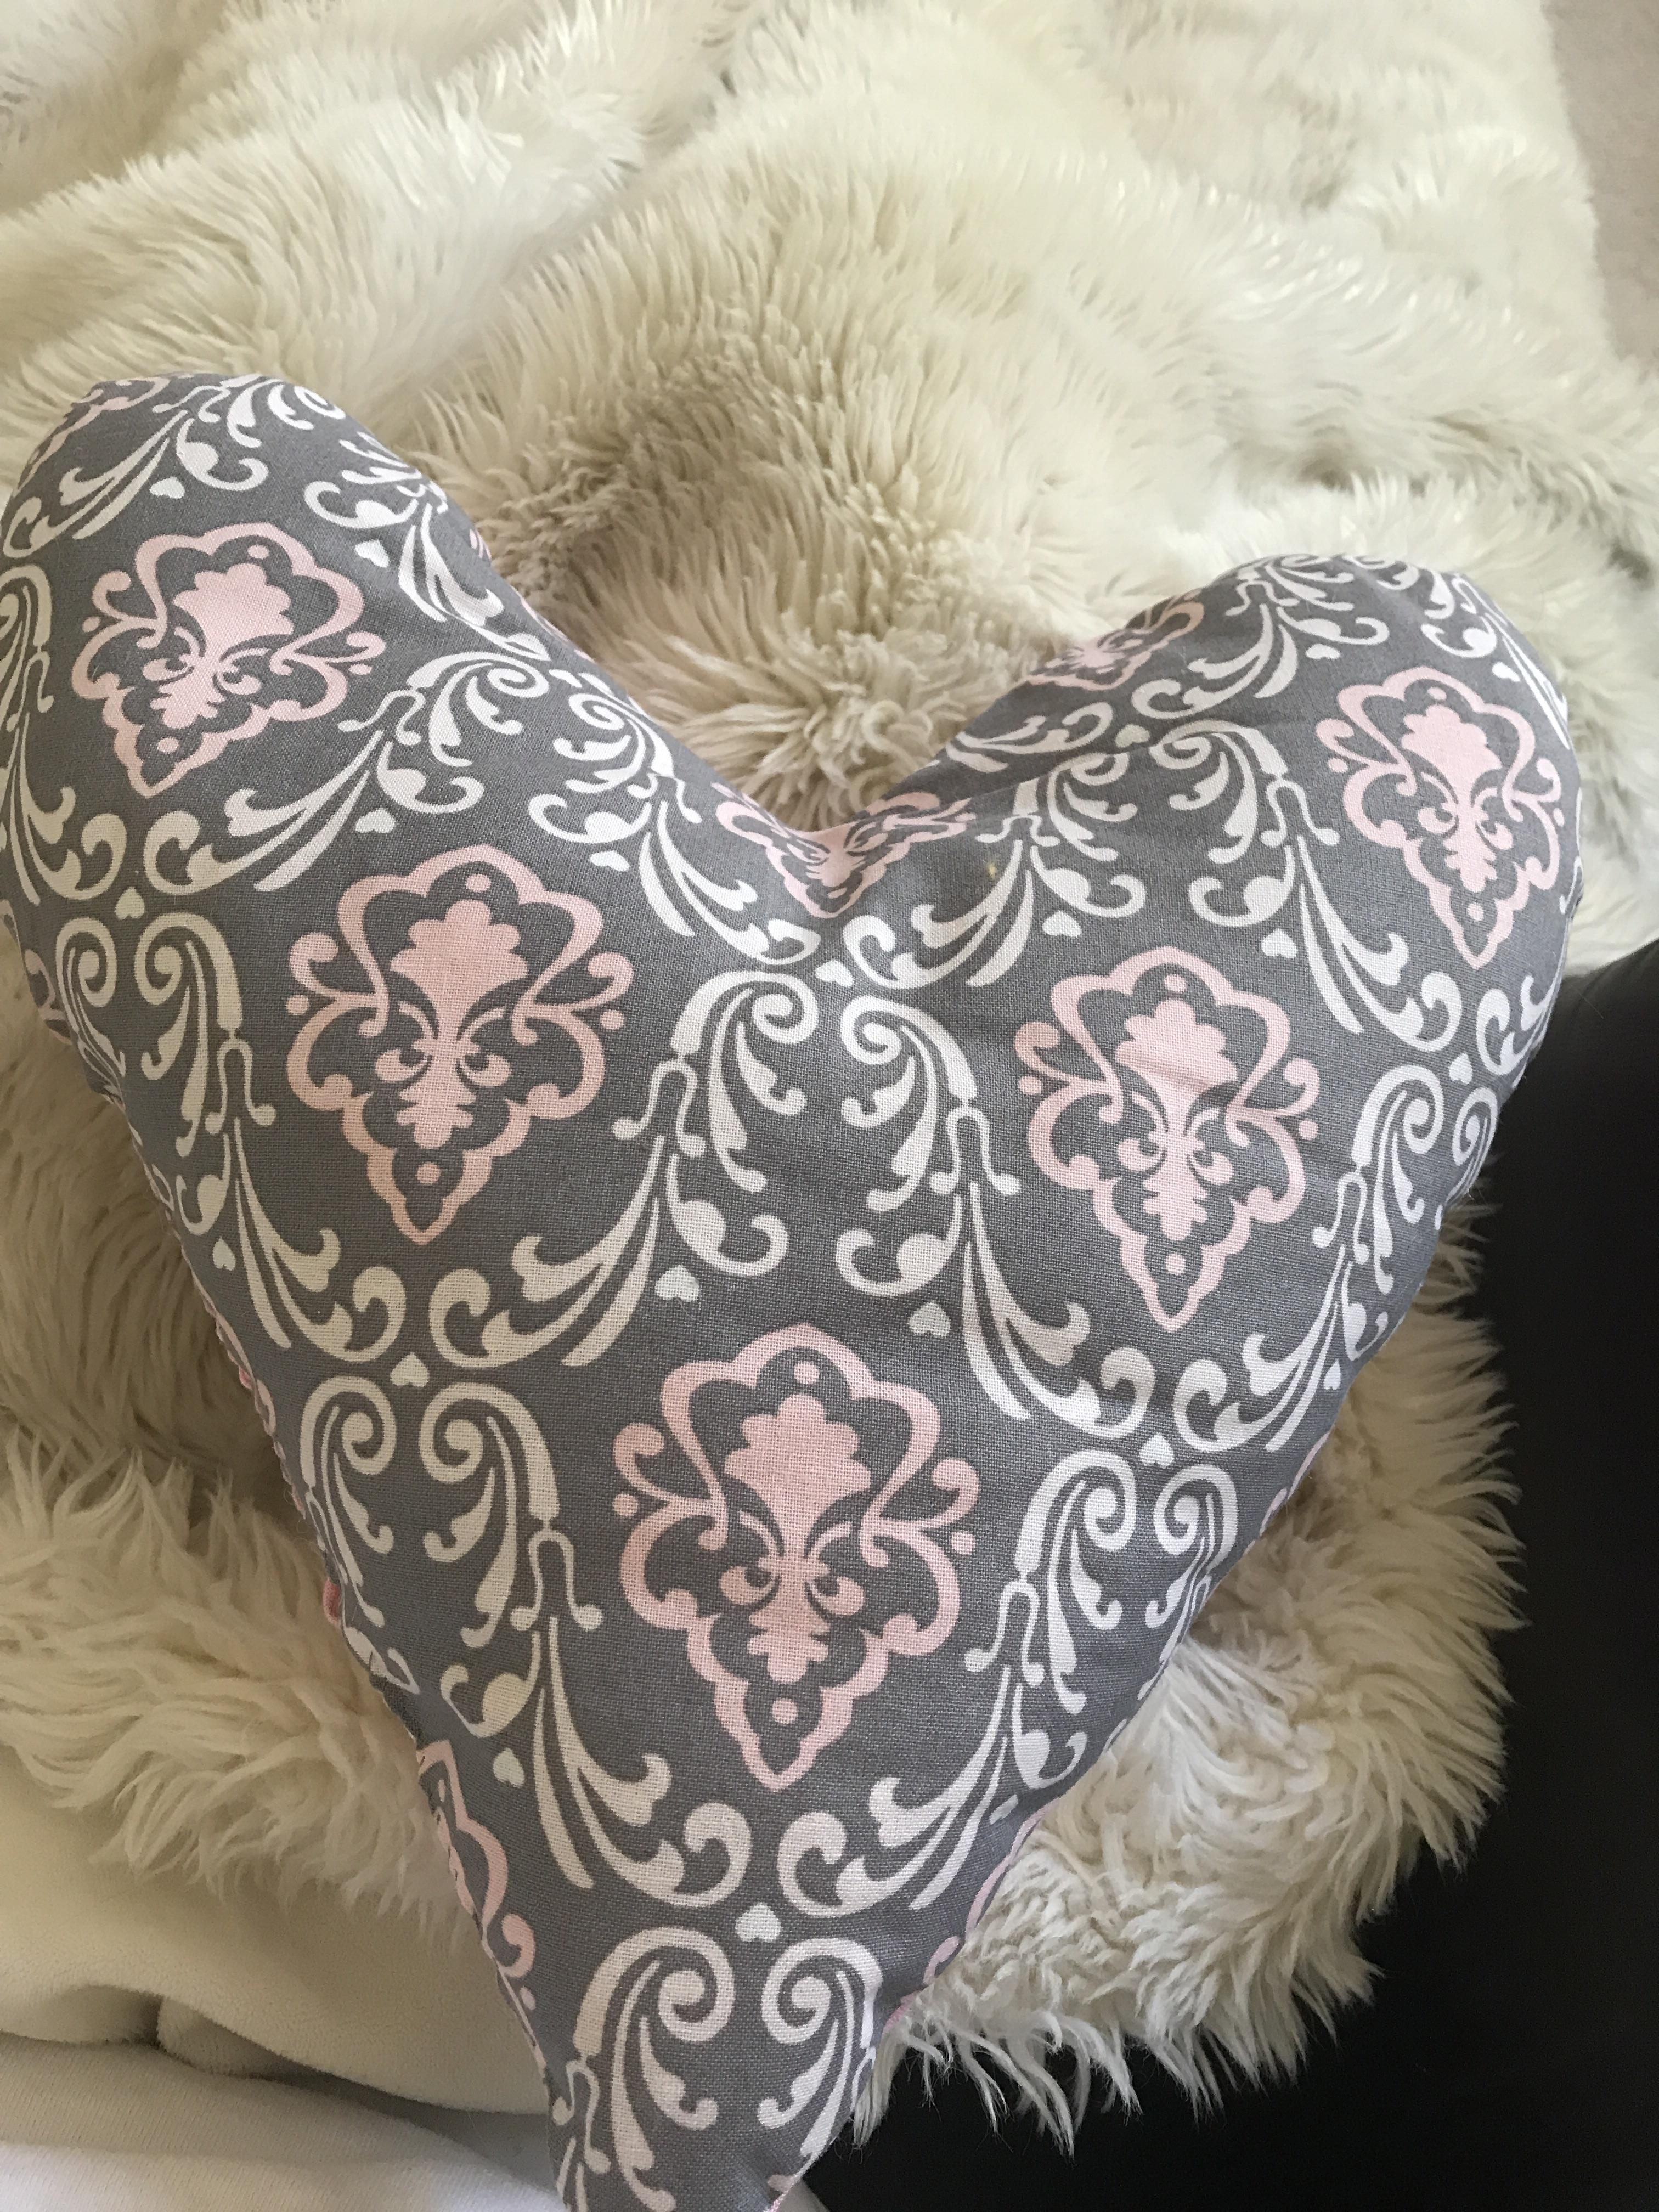 Fullsize Of My Breast Friend